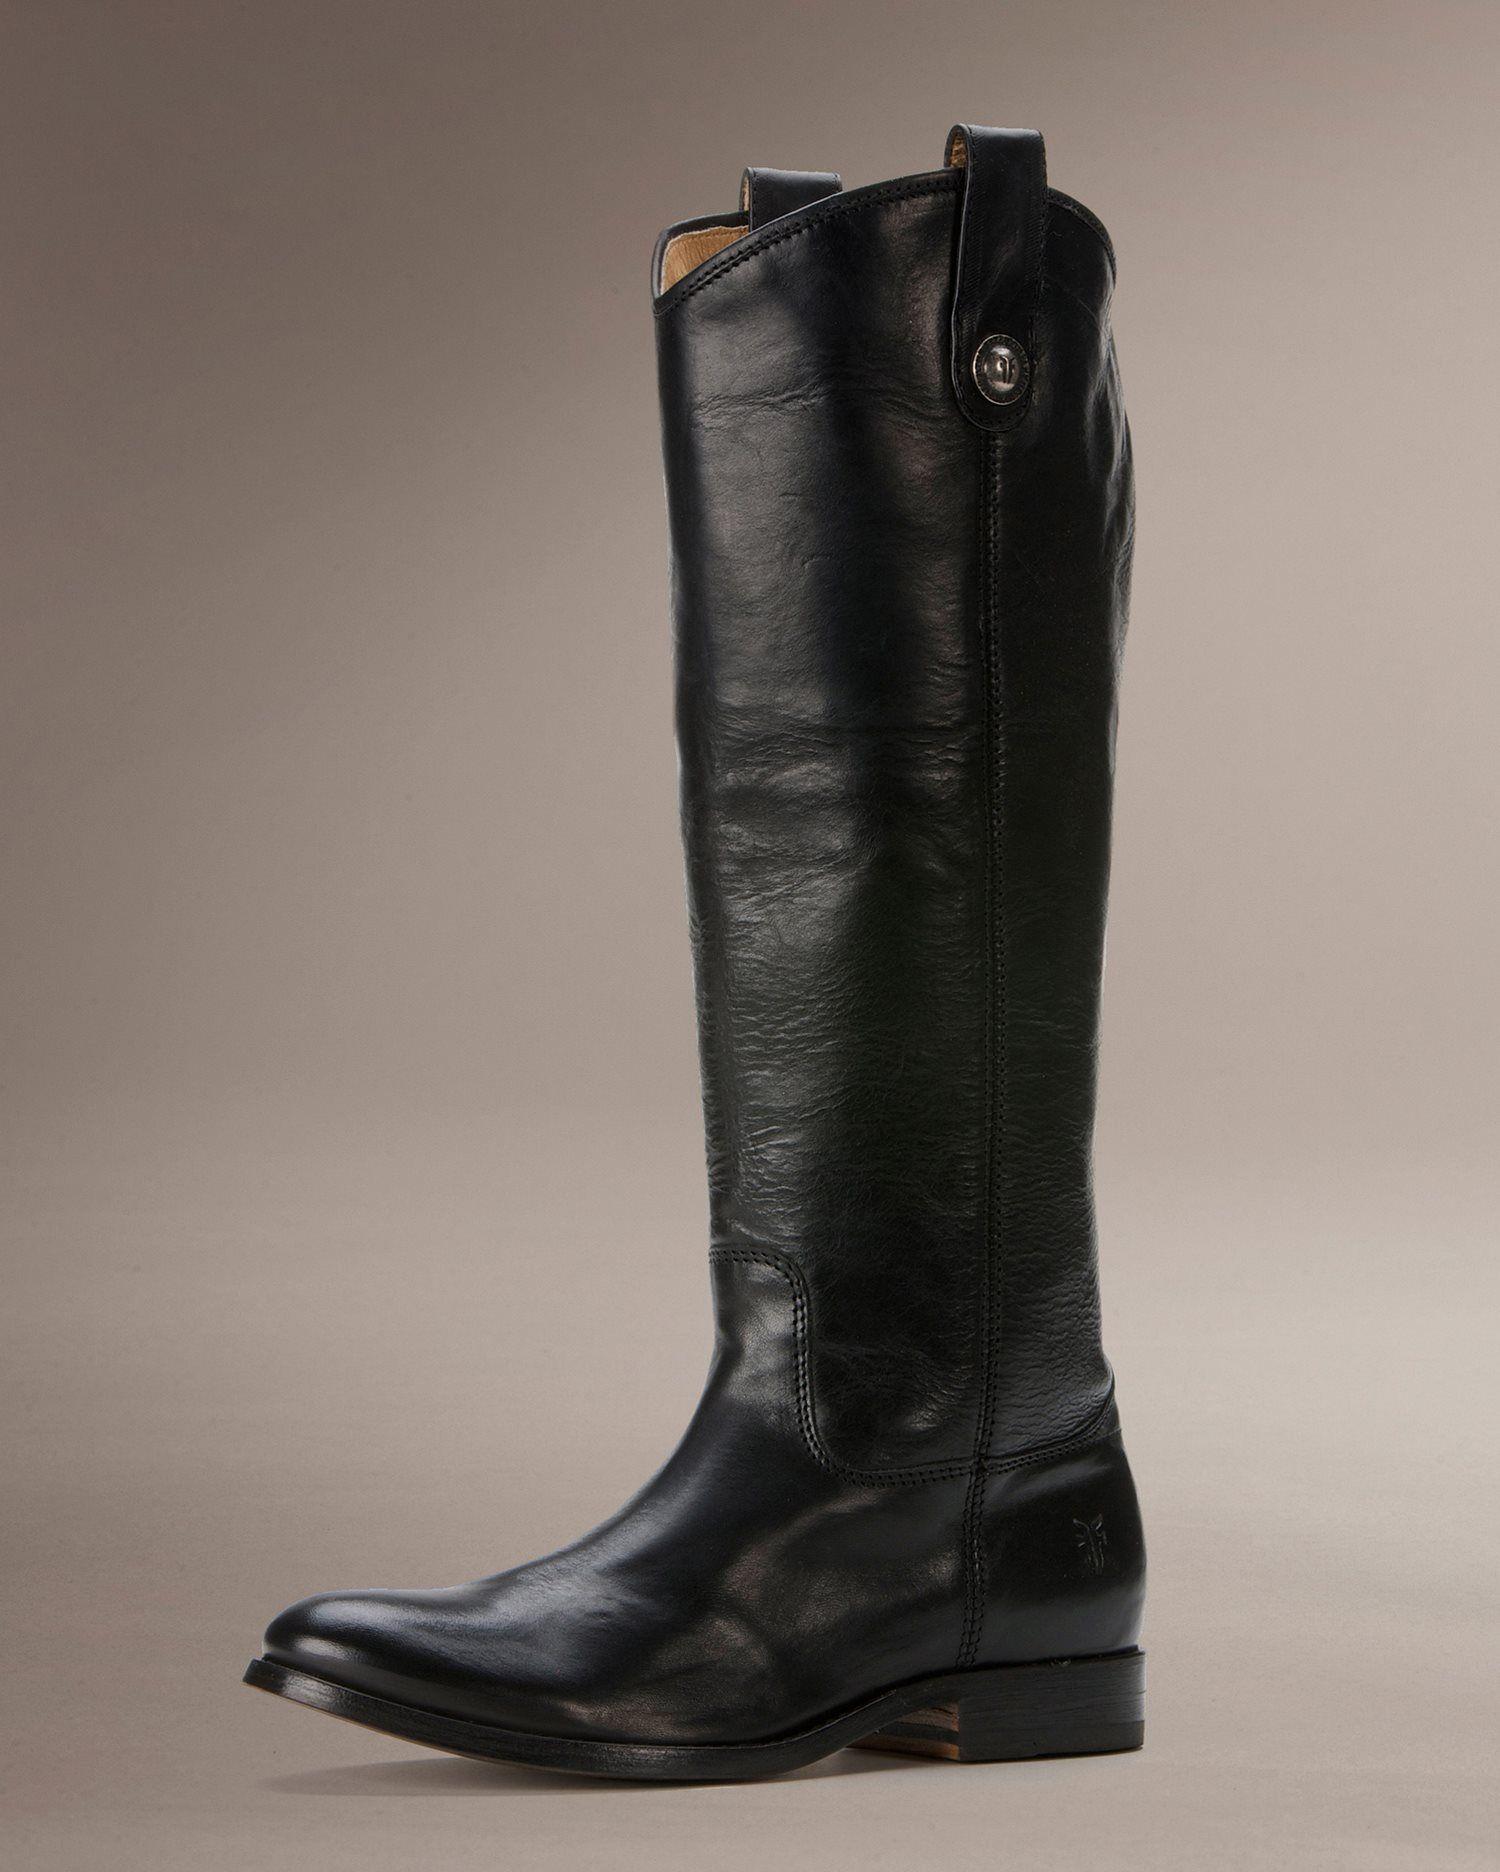 a0c94e472eb7 Melissa Button - Women Boots Melissa Collection - The Frye Company ...